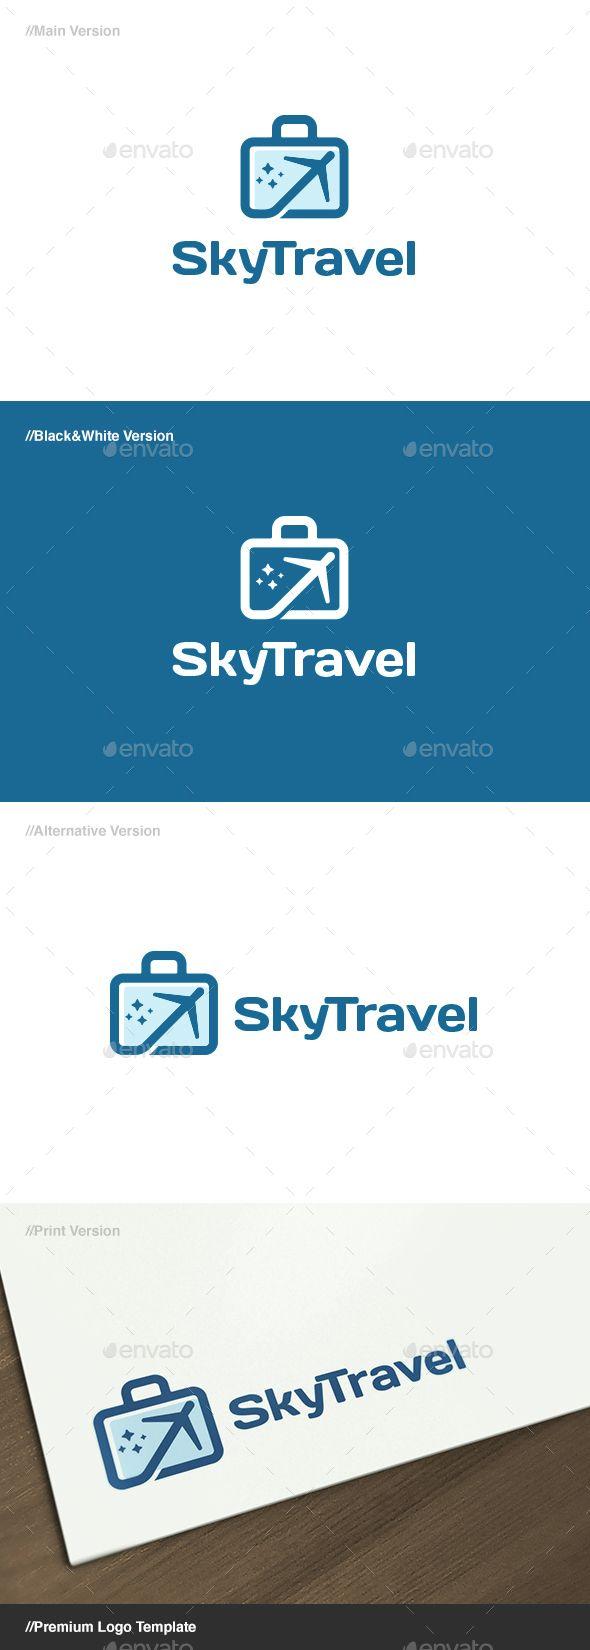 Sky Travel Logo — Vector EPS #travel #corporate • Available here → https://graphicriver.net/item/sky-travel-logo/15355466?ref=pxcr